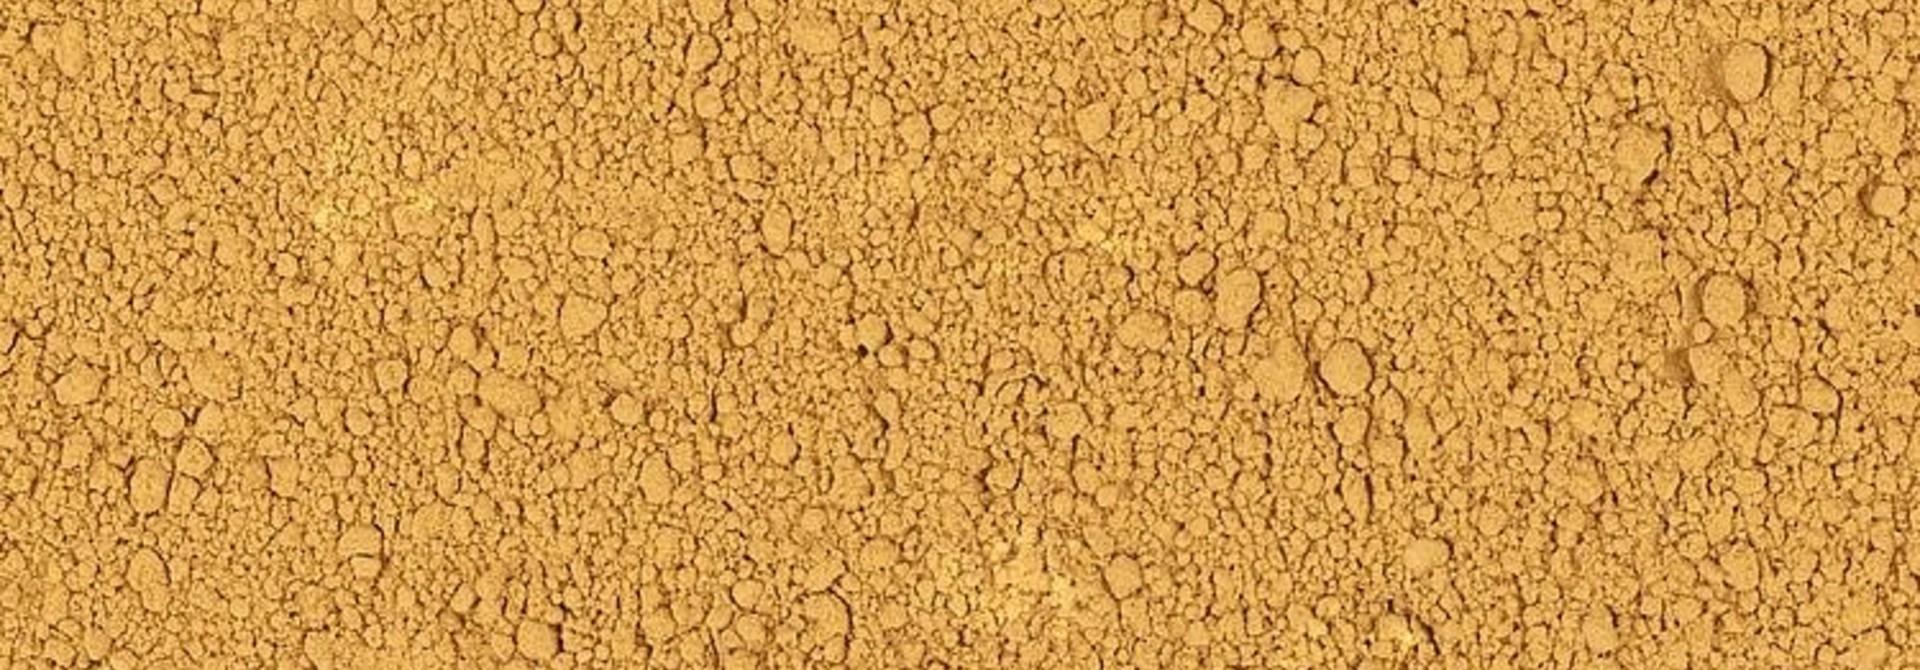 170820 Strooimateriaal, Poeder, kleiondergrond, okergeel, 240 g